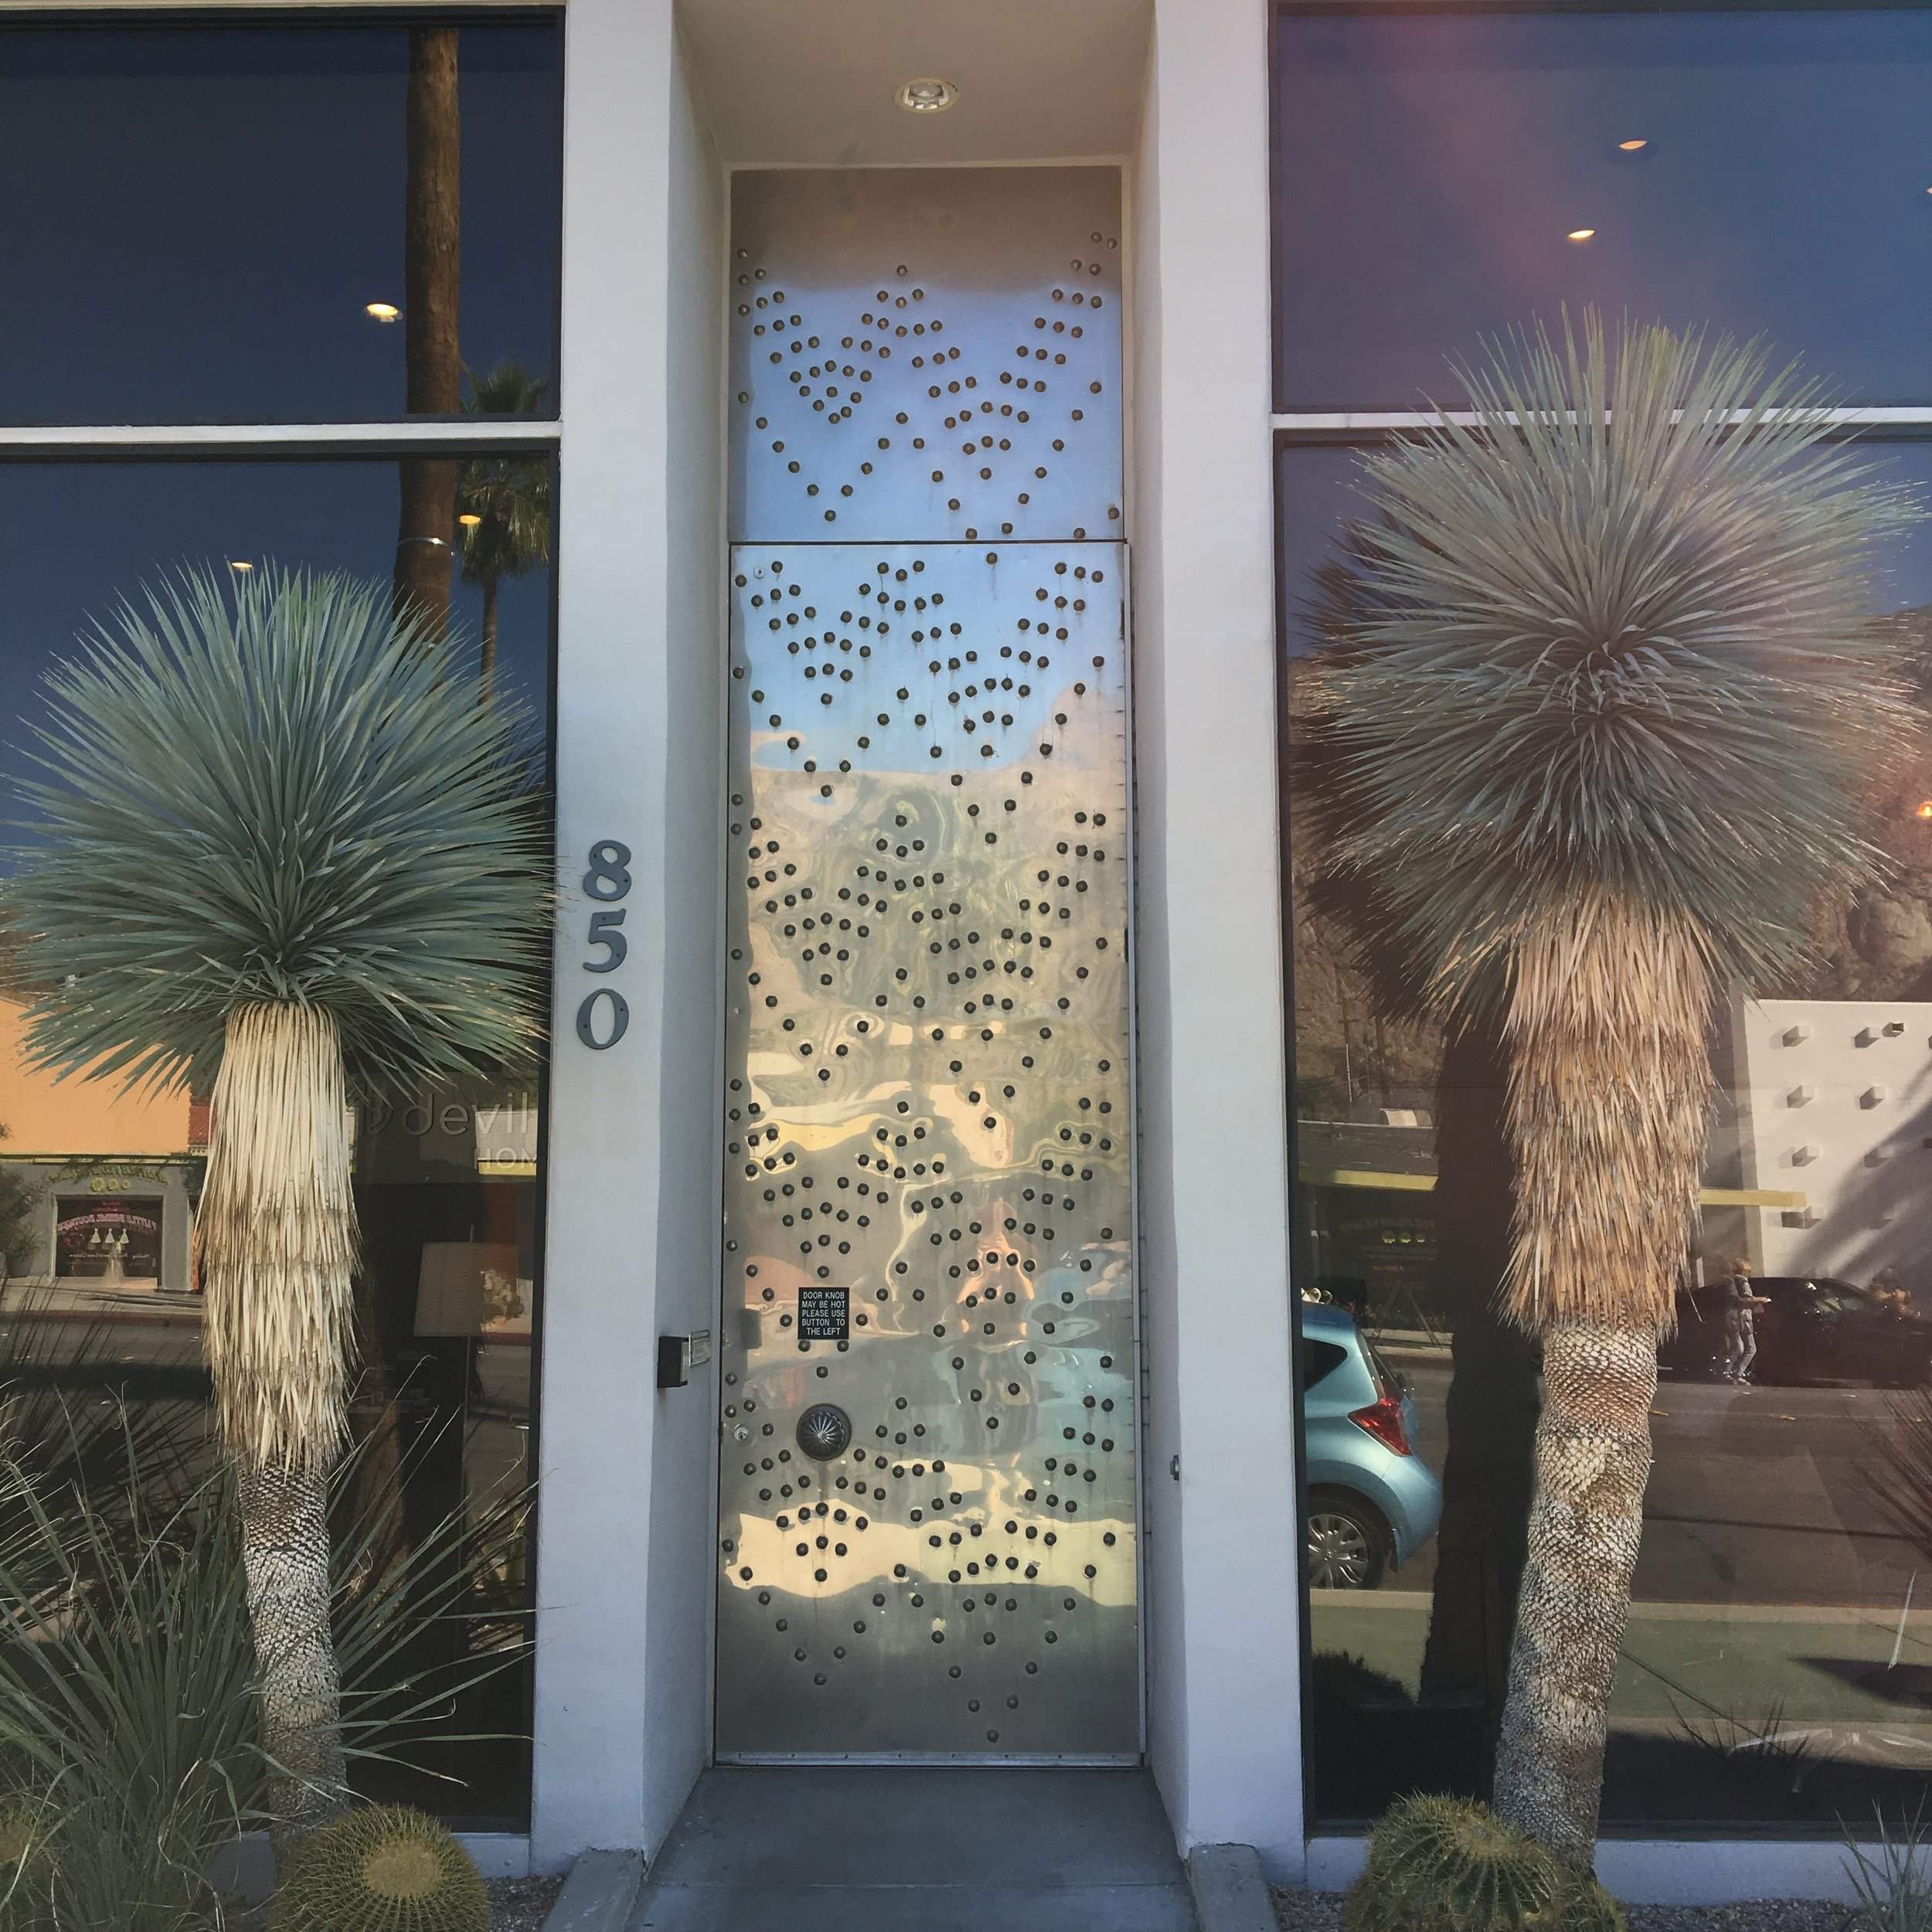 statement door. Architectural tour of palm springs. Blue Moon furniture store winnipeg.JPG